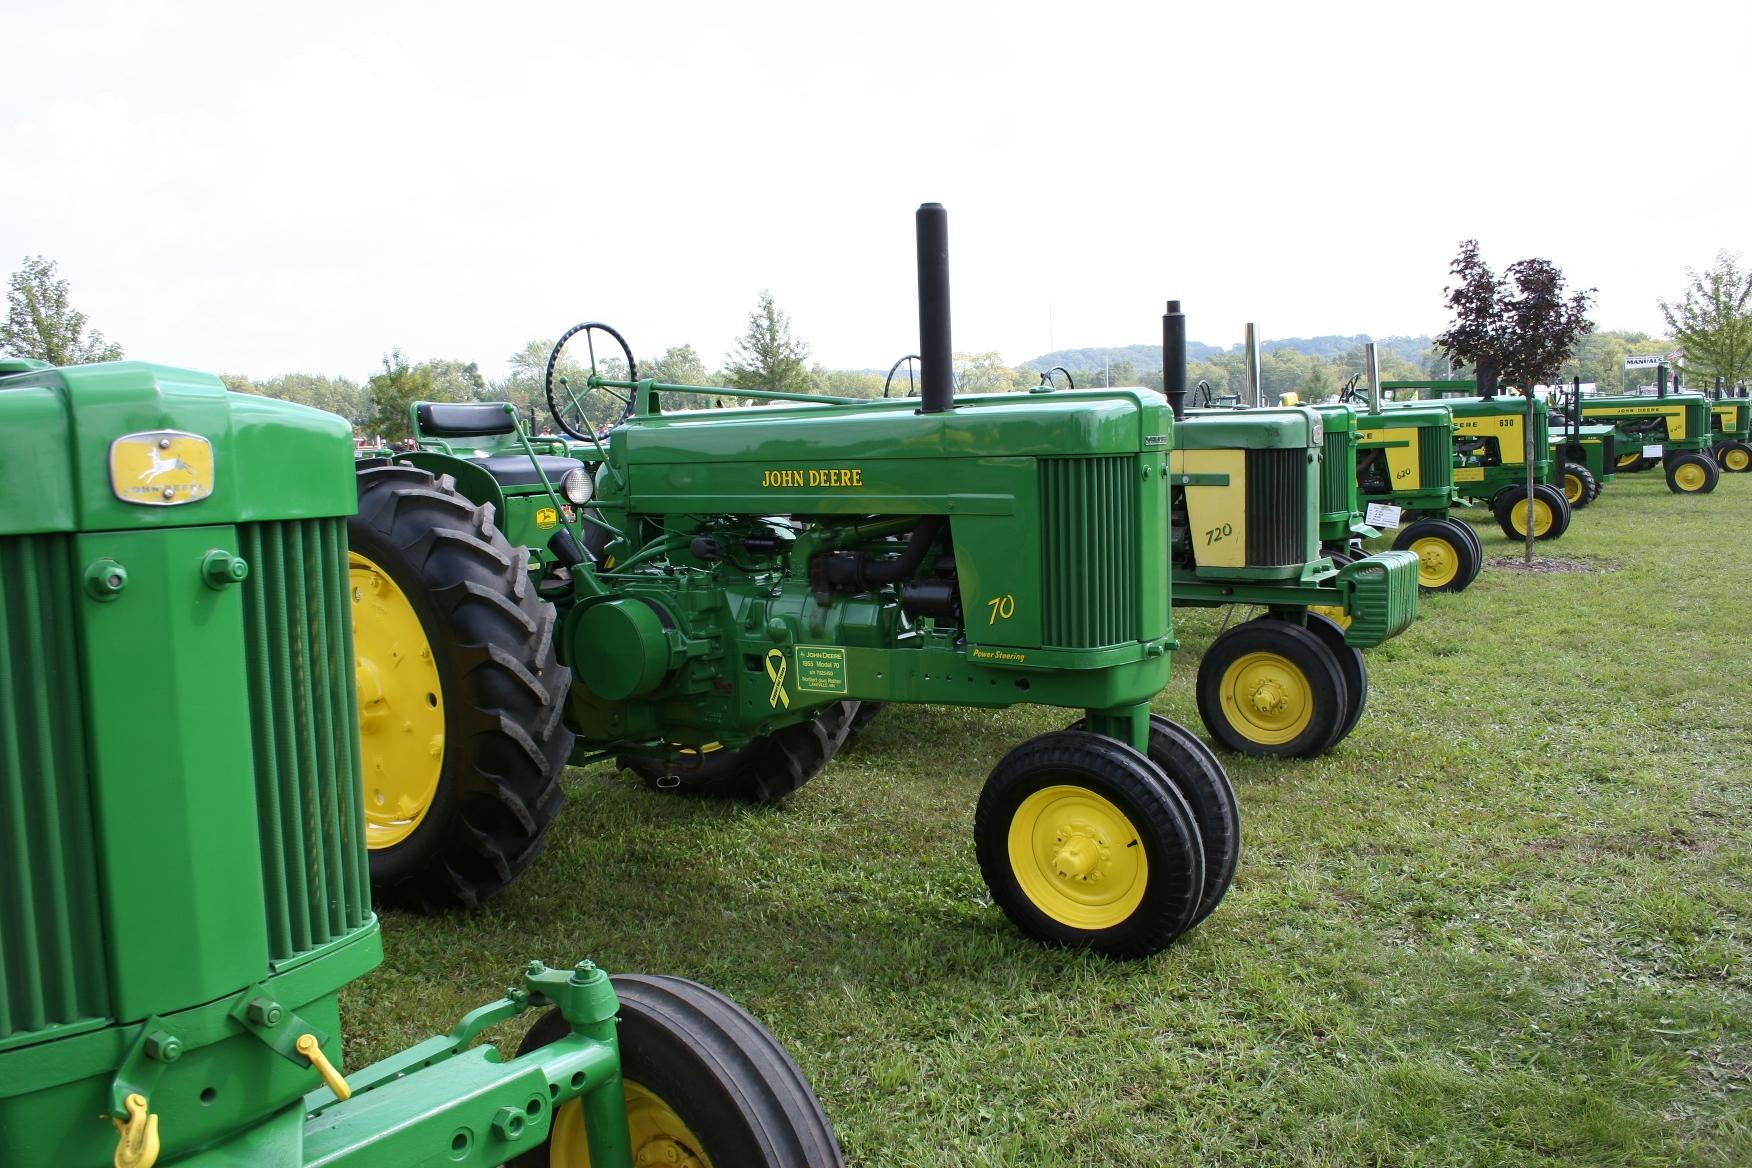 John Deere Tractor Shows : Credit river antique tractor club show minnesota prairie